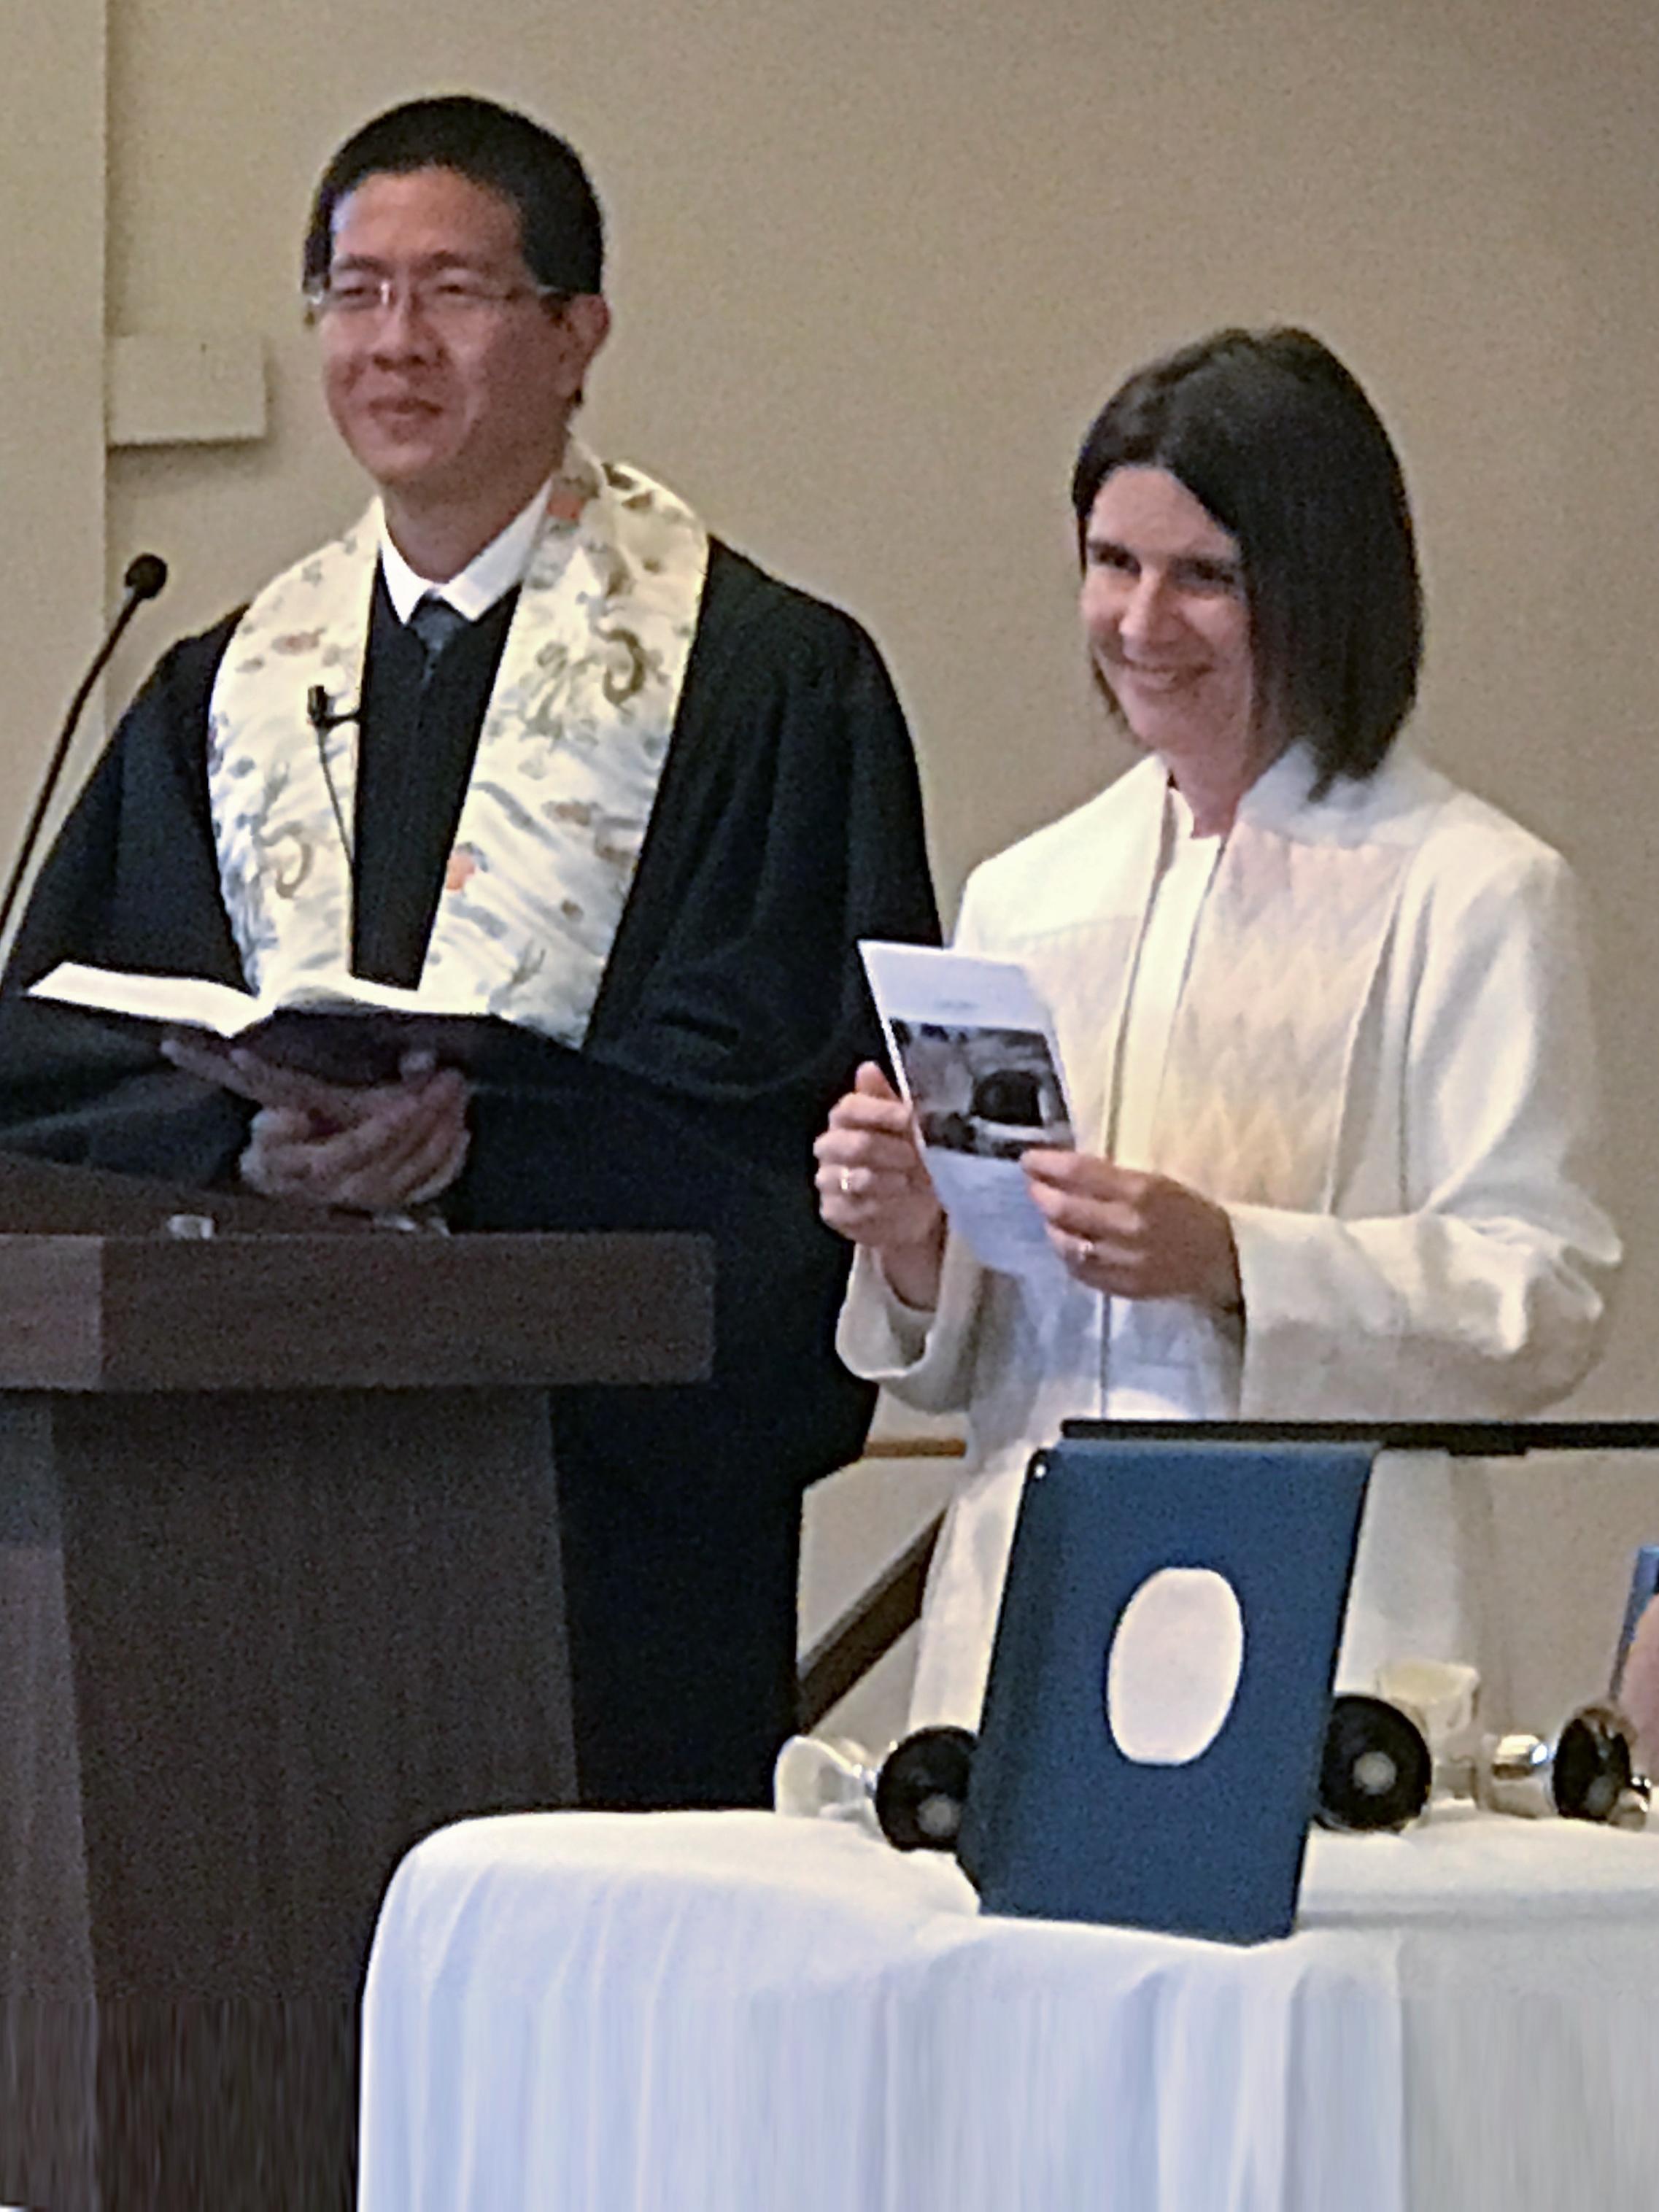 Revs Andy Wong and Lindsay Woods Wong